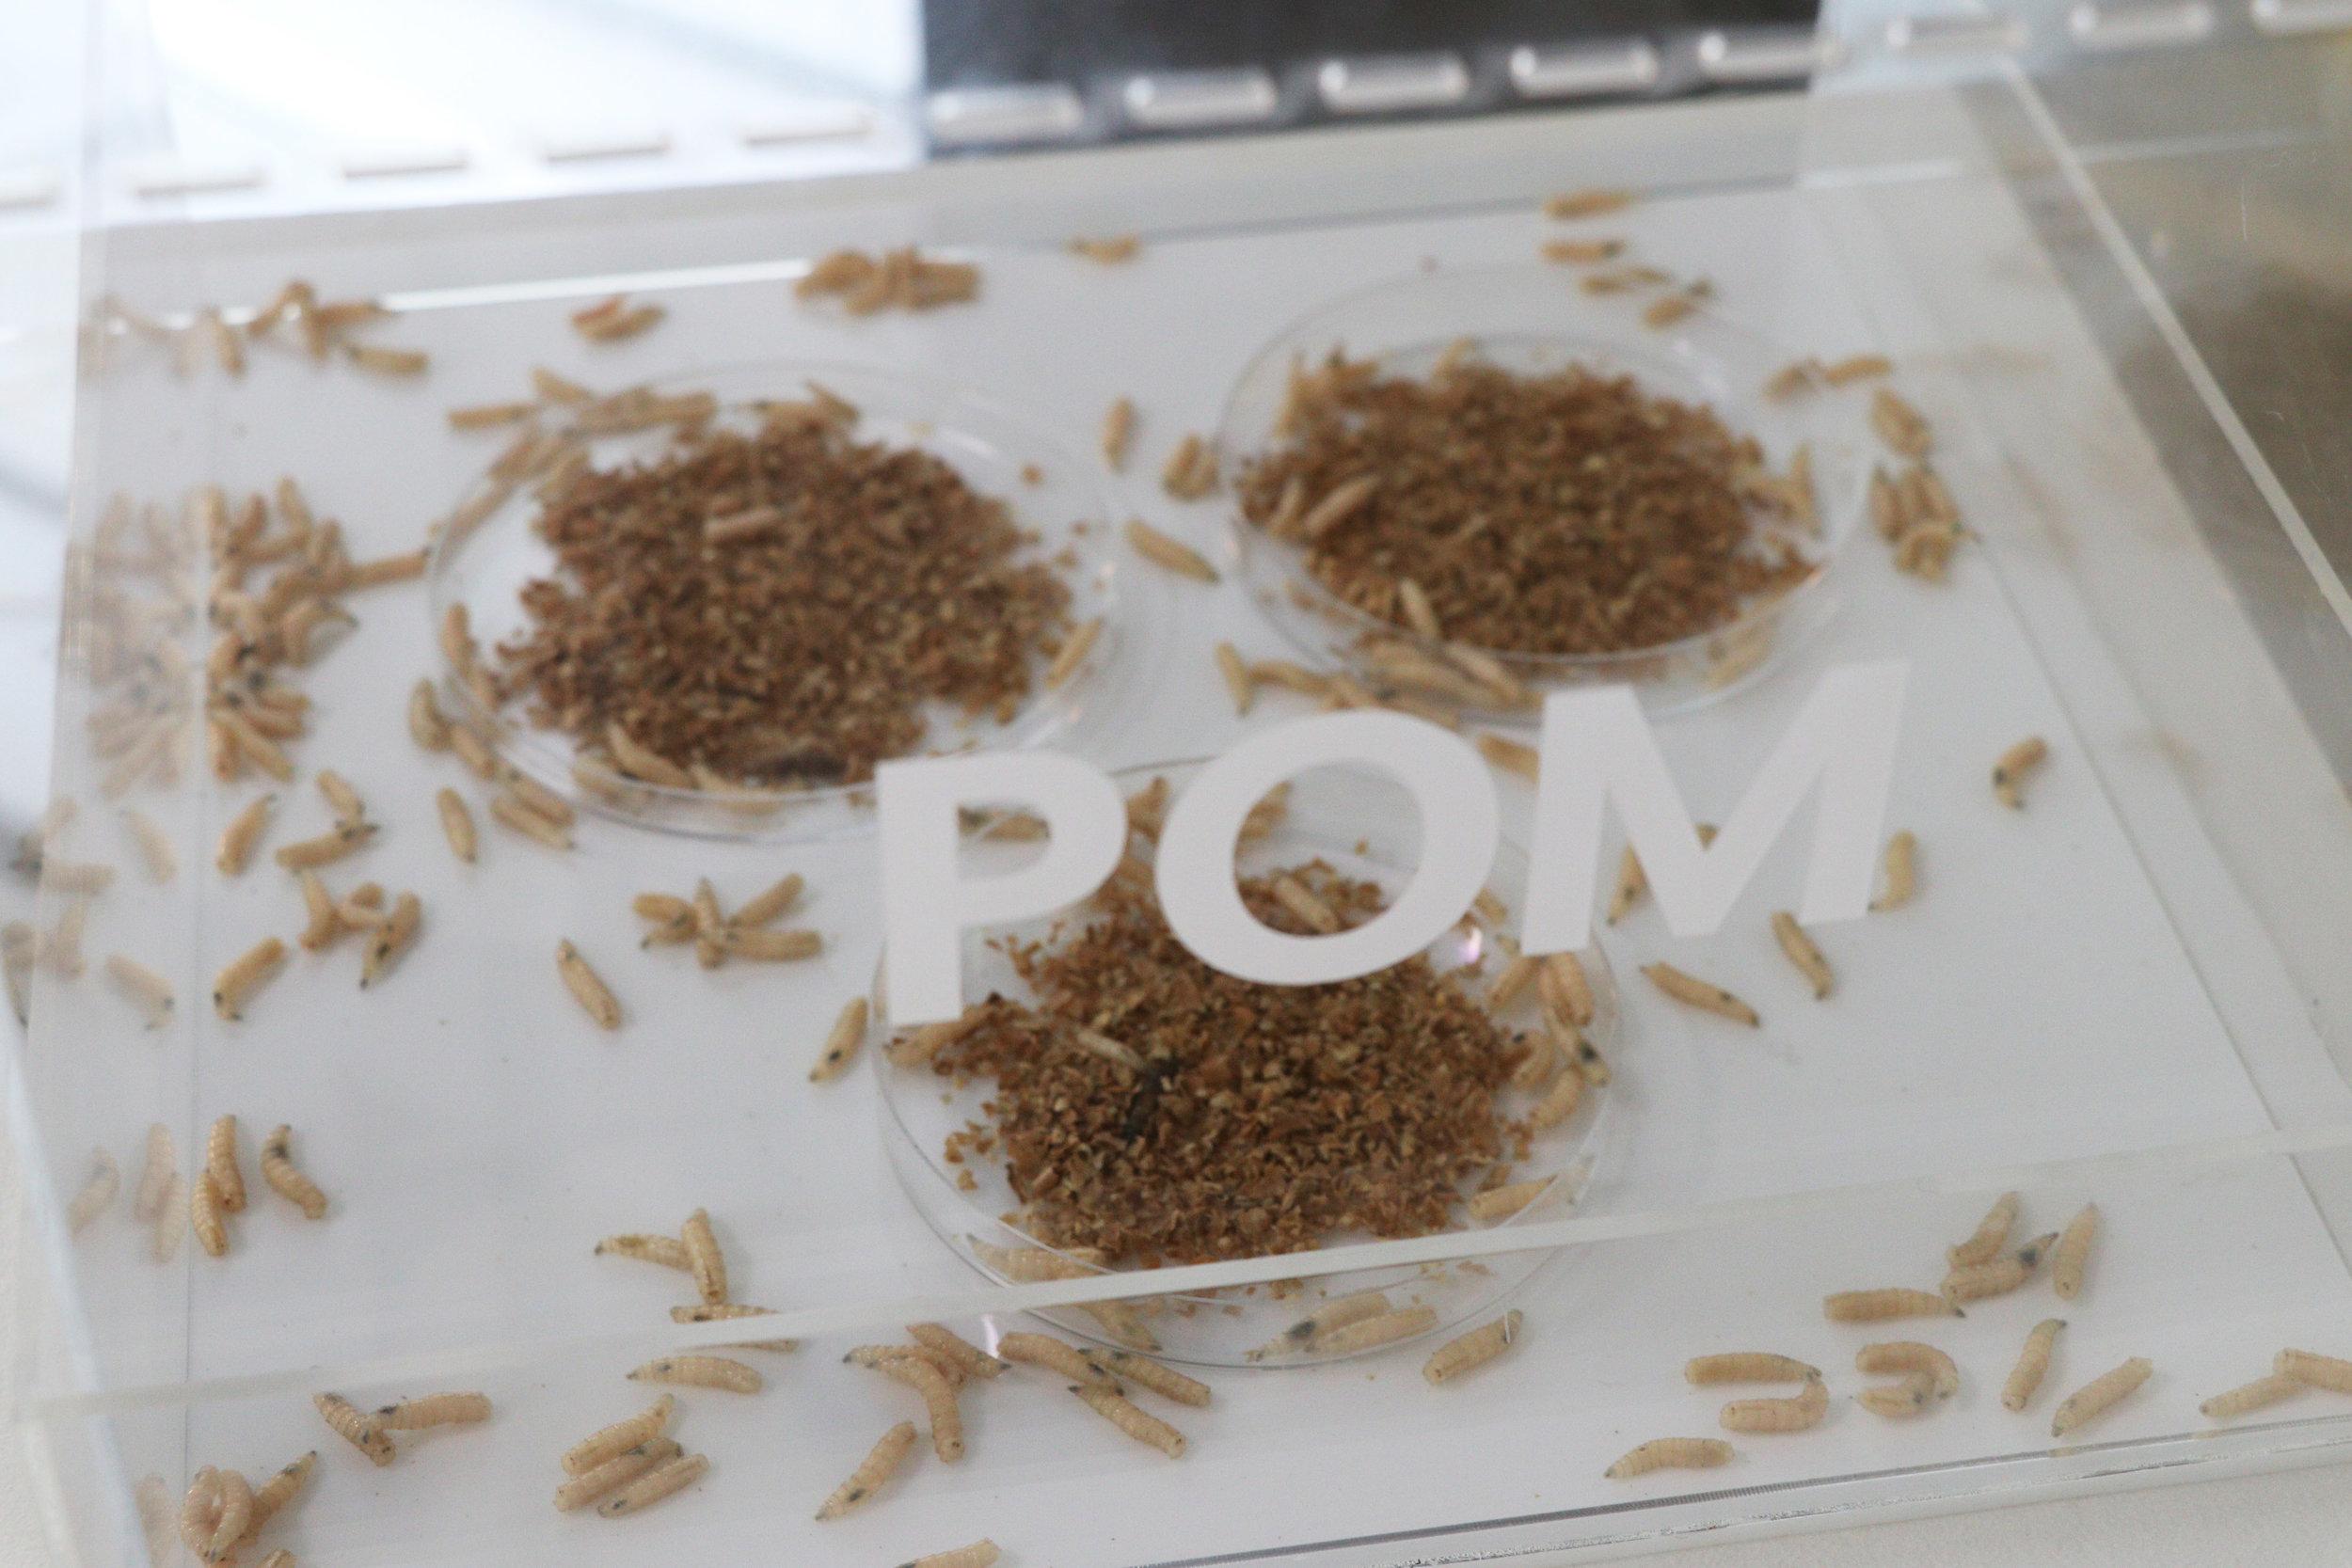 Copy of POM_Larvae.JPG